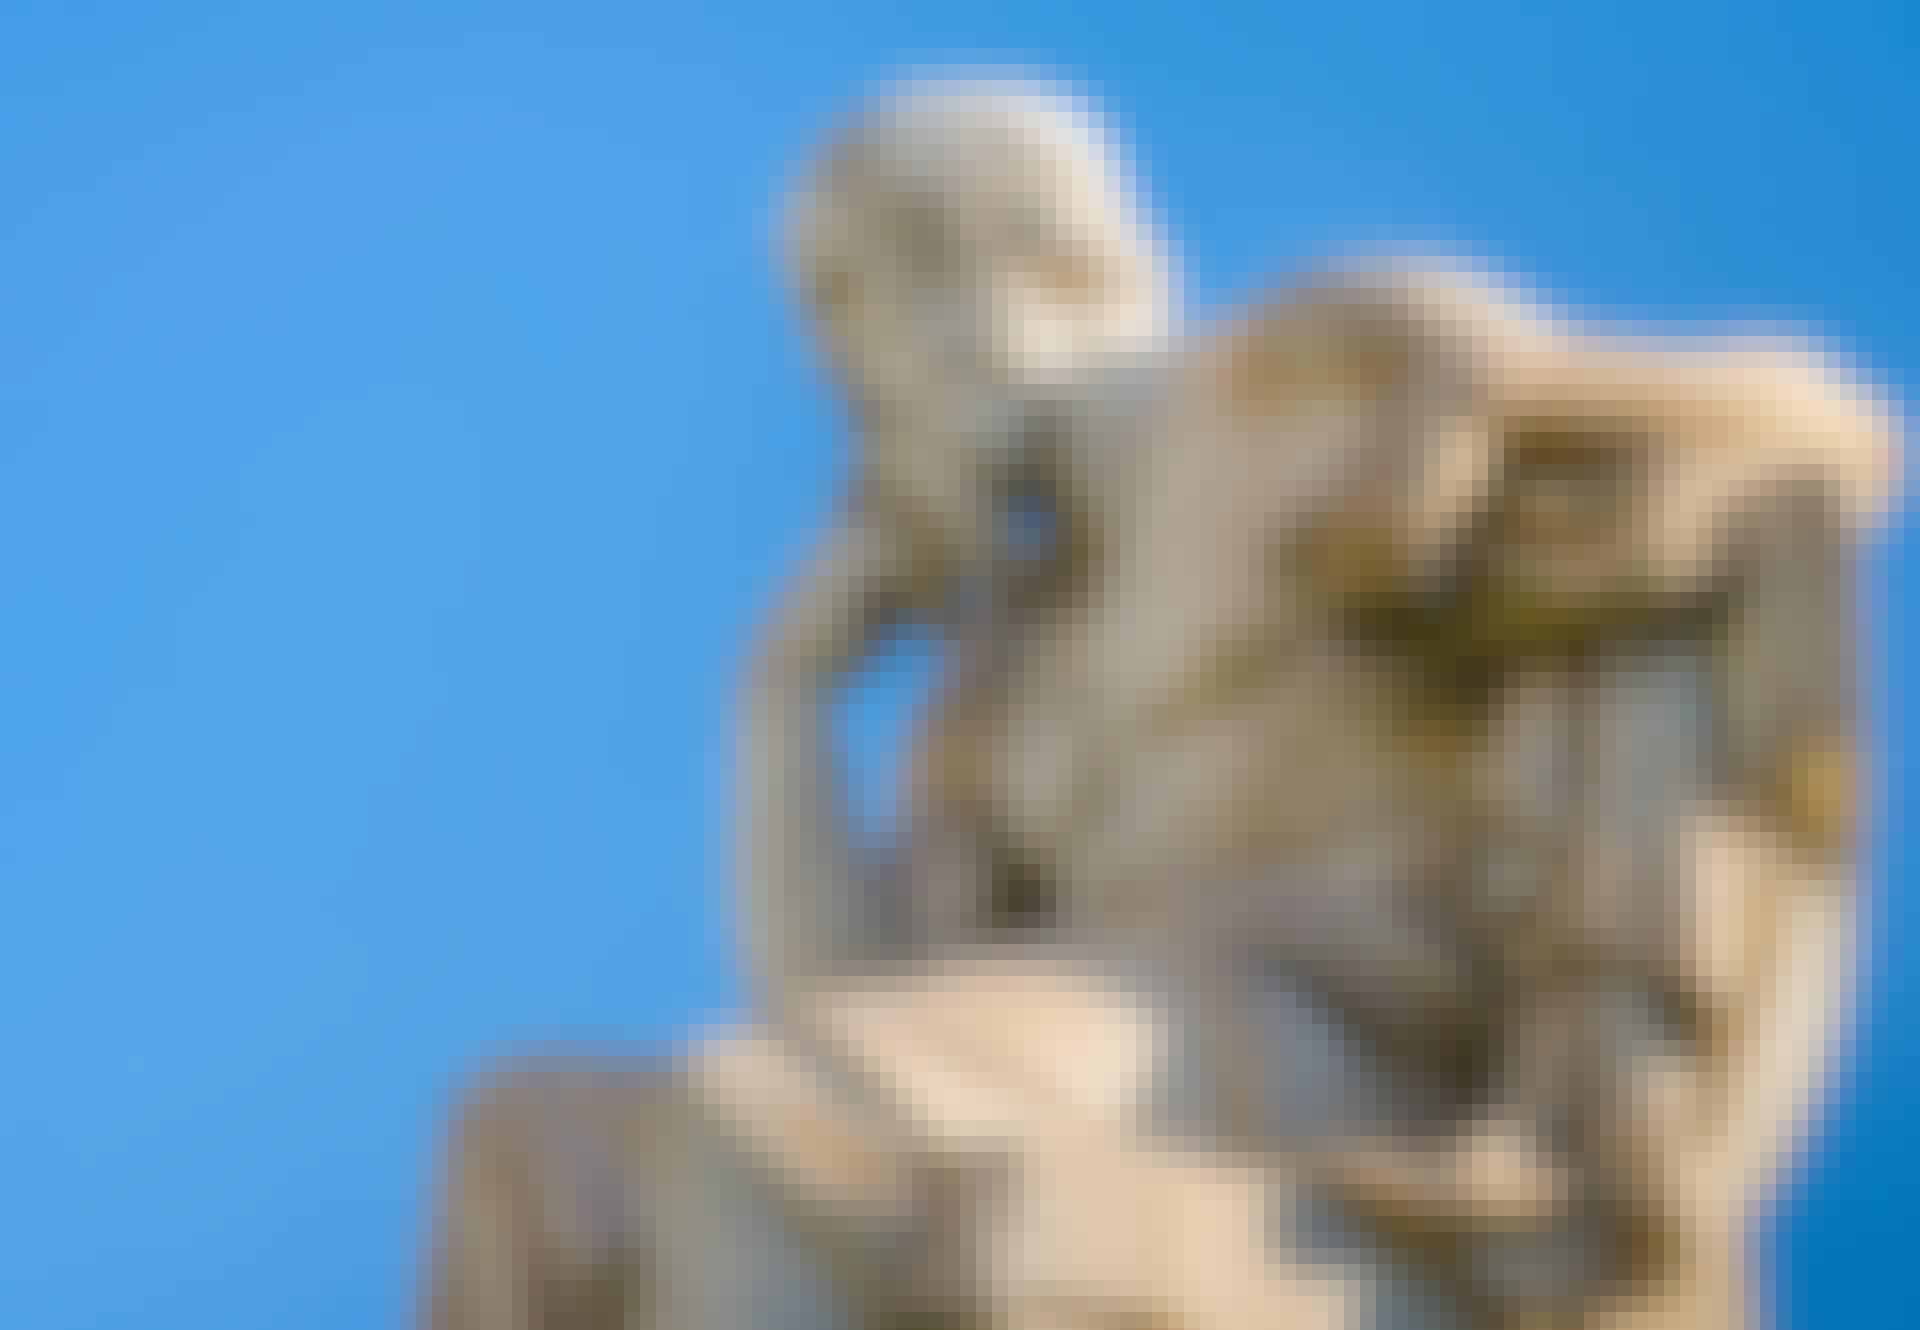 sokrates grækere filosofi